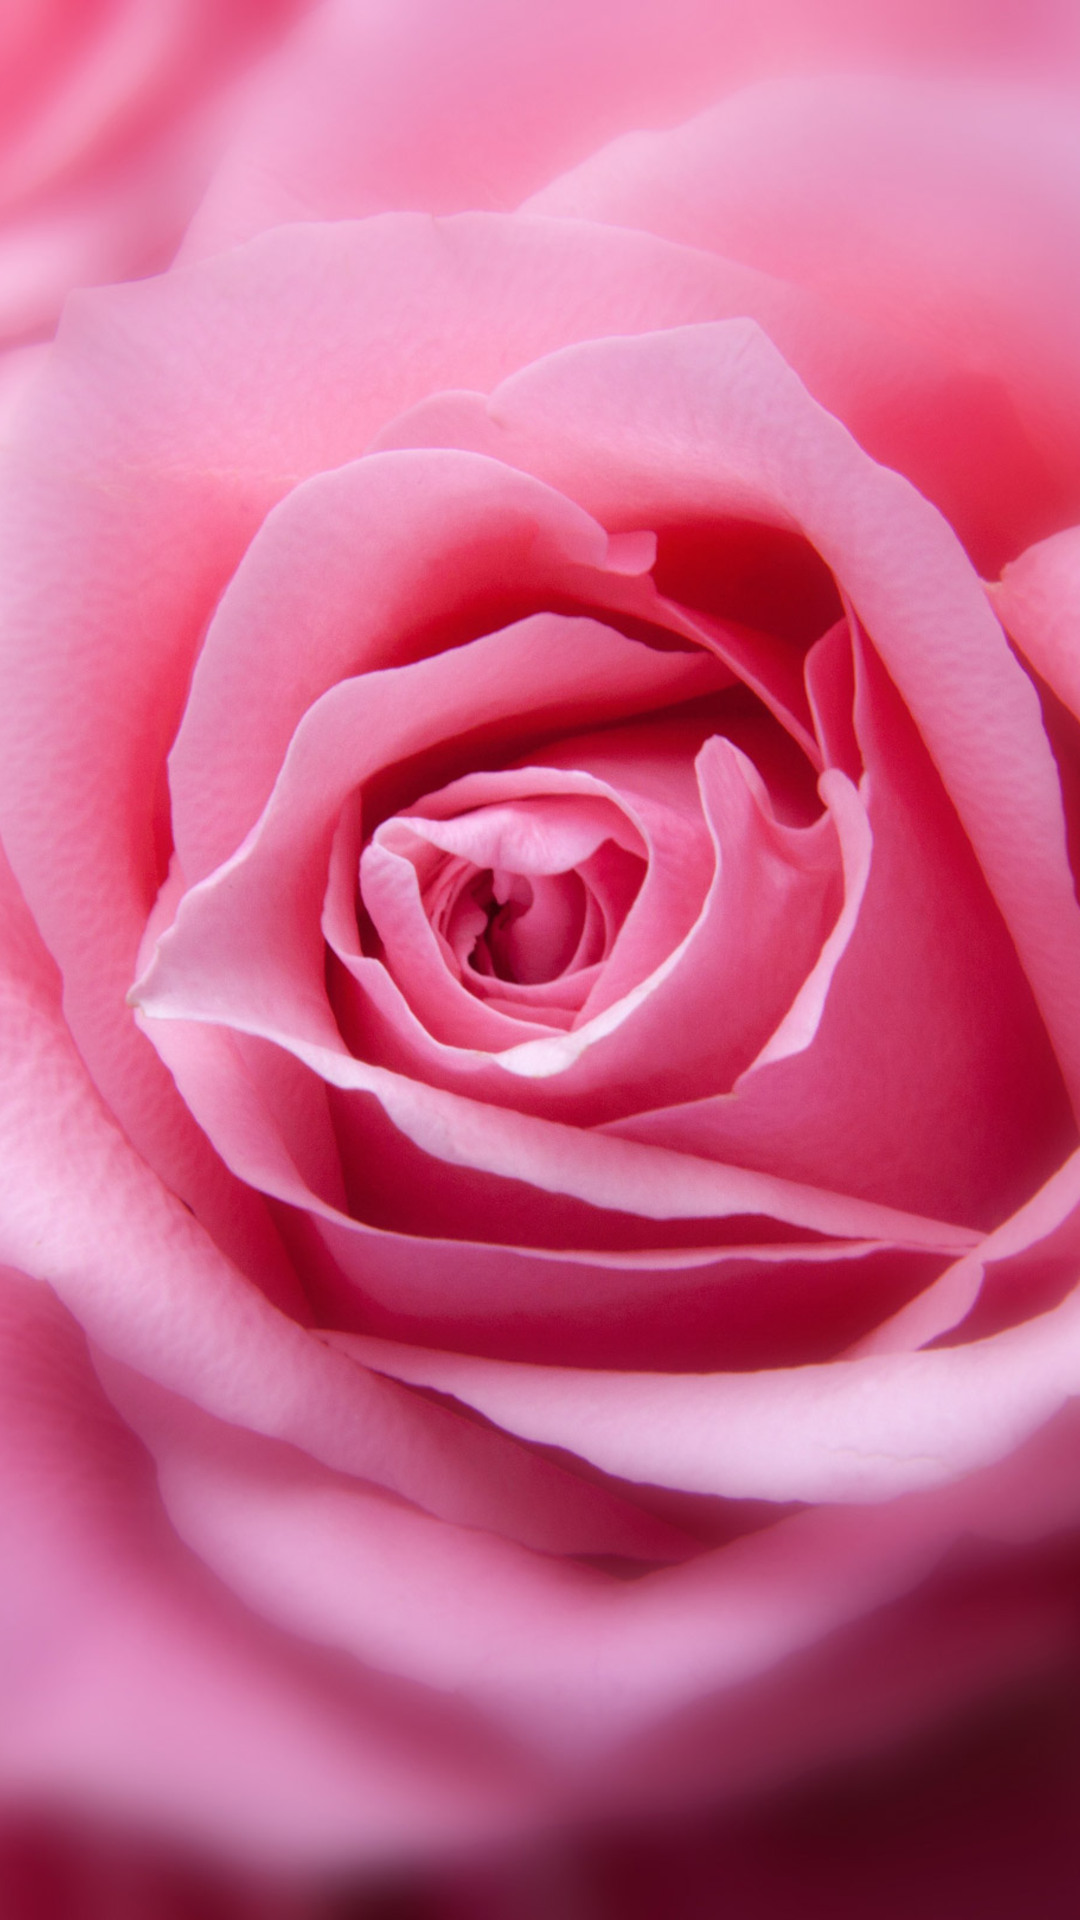 pink-rose-hd-img.jpg